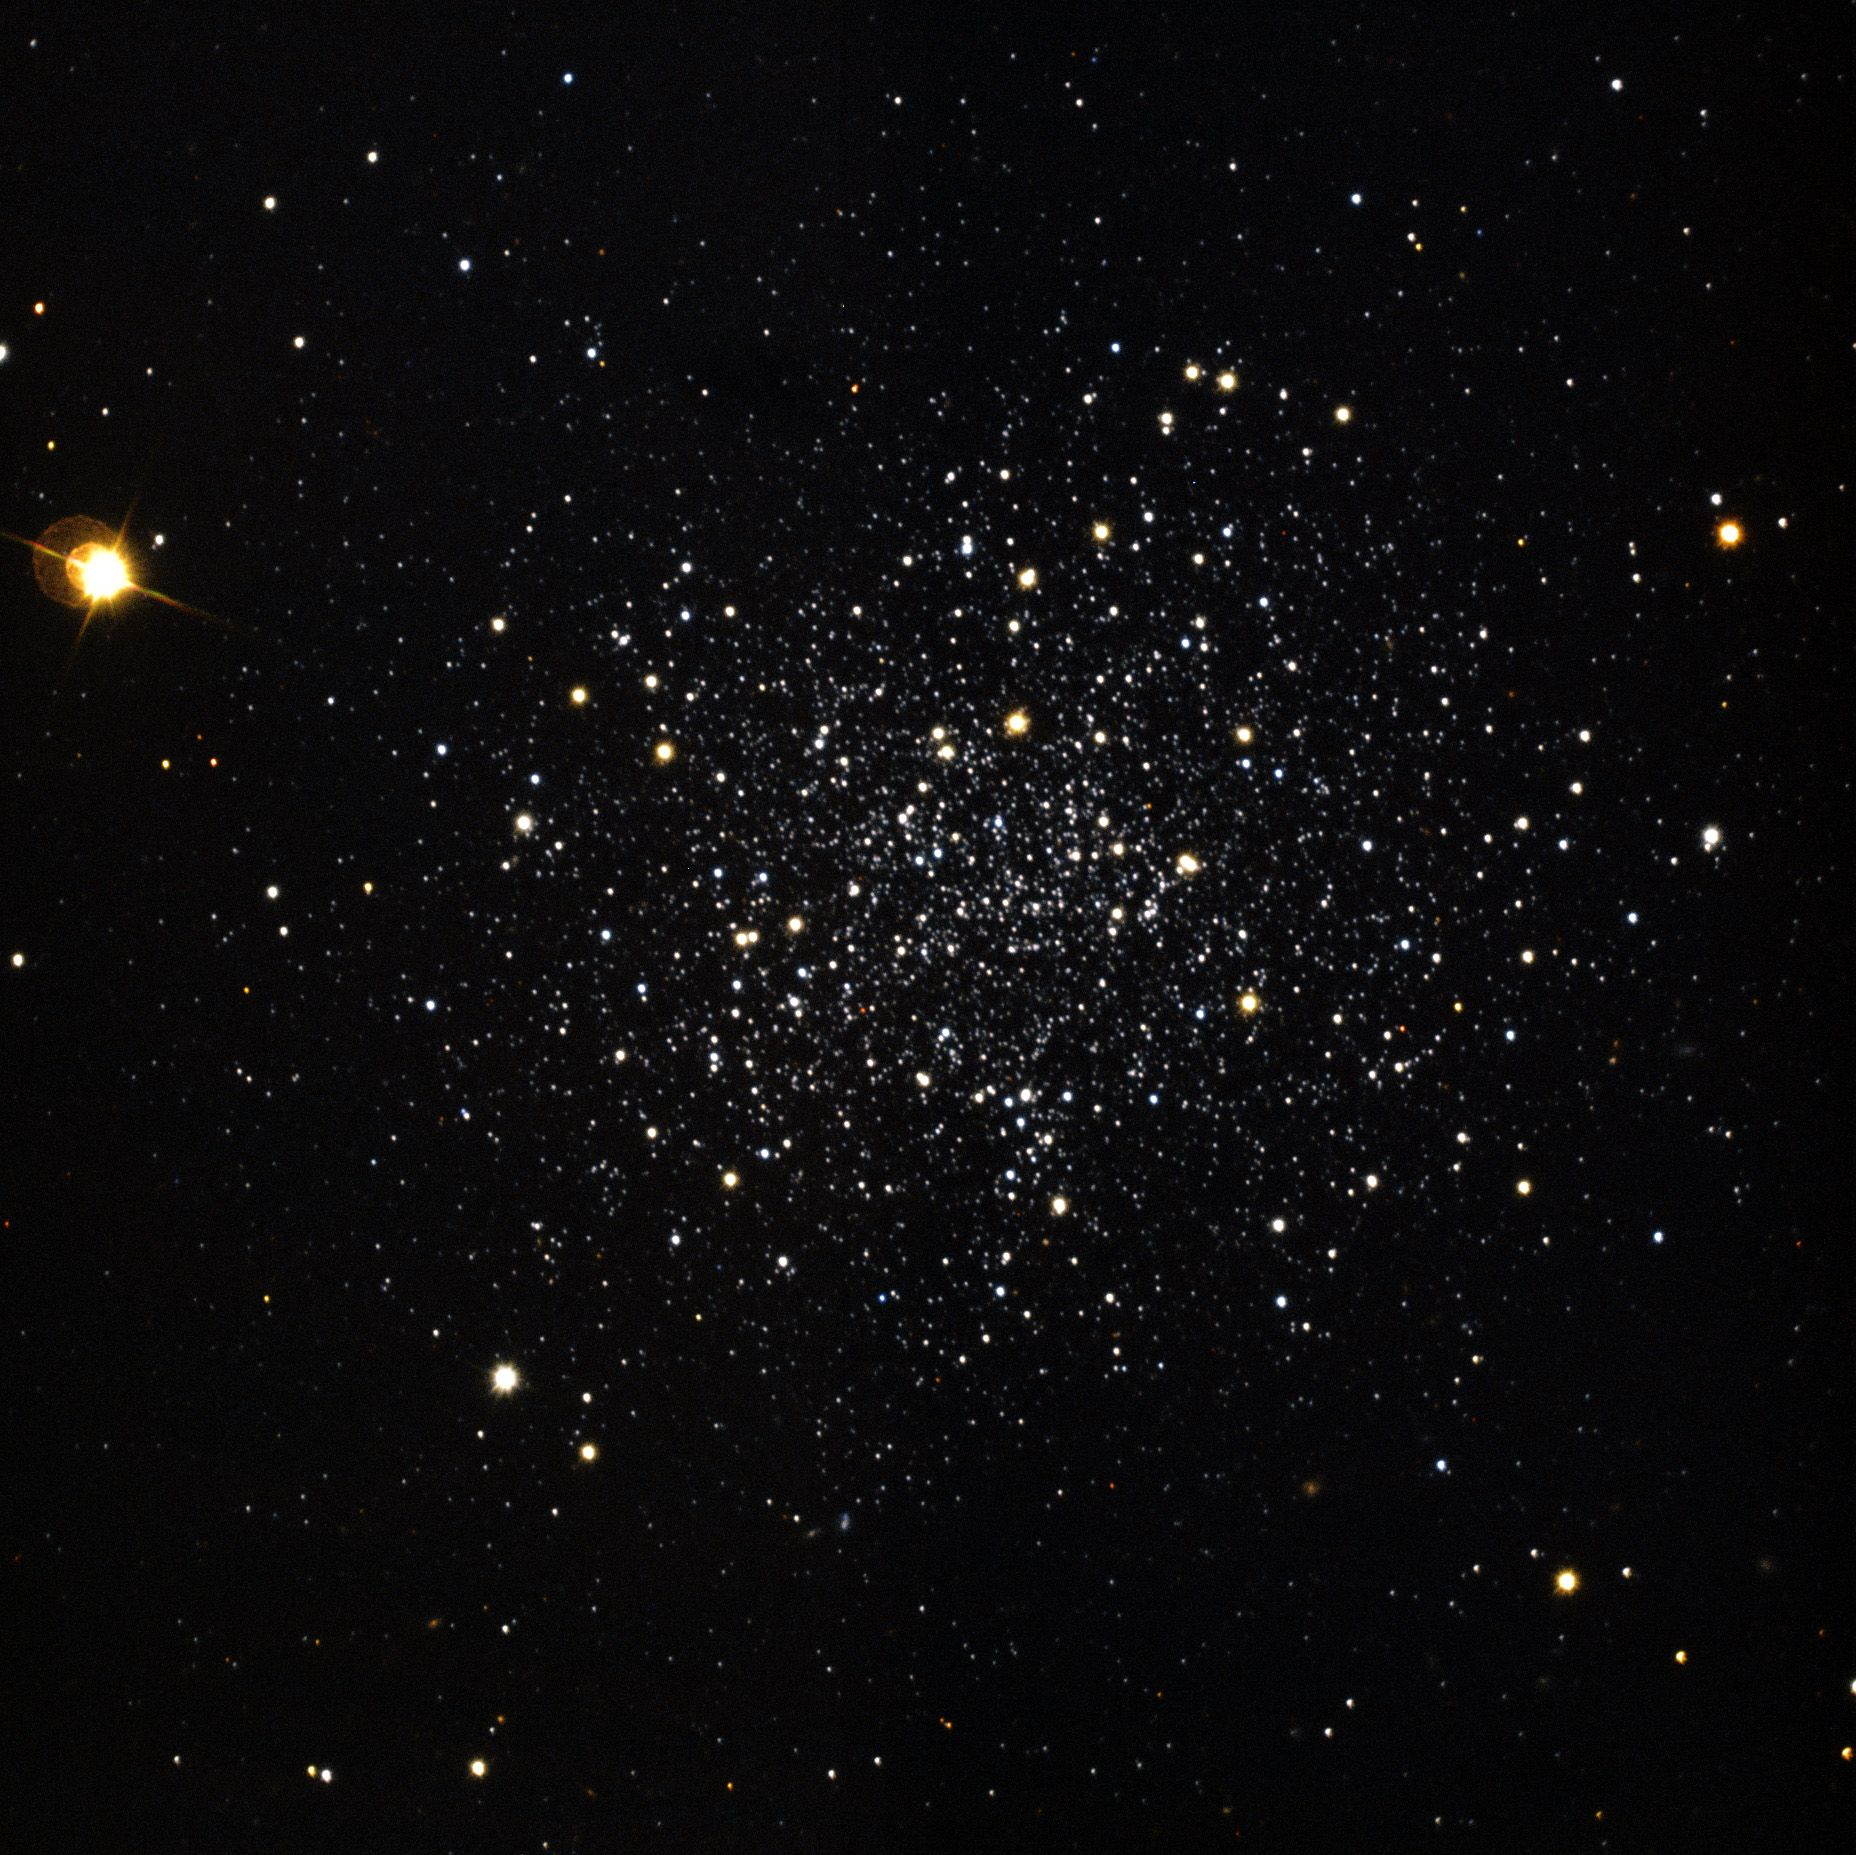 Globular Cluster NGC 5053